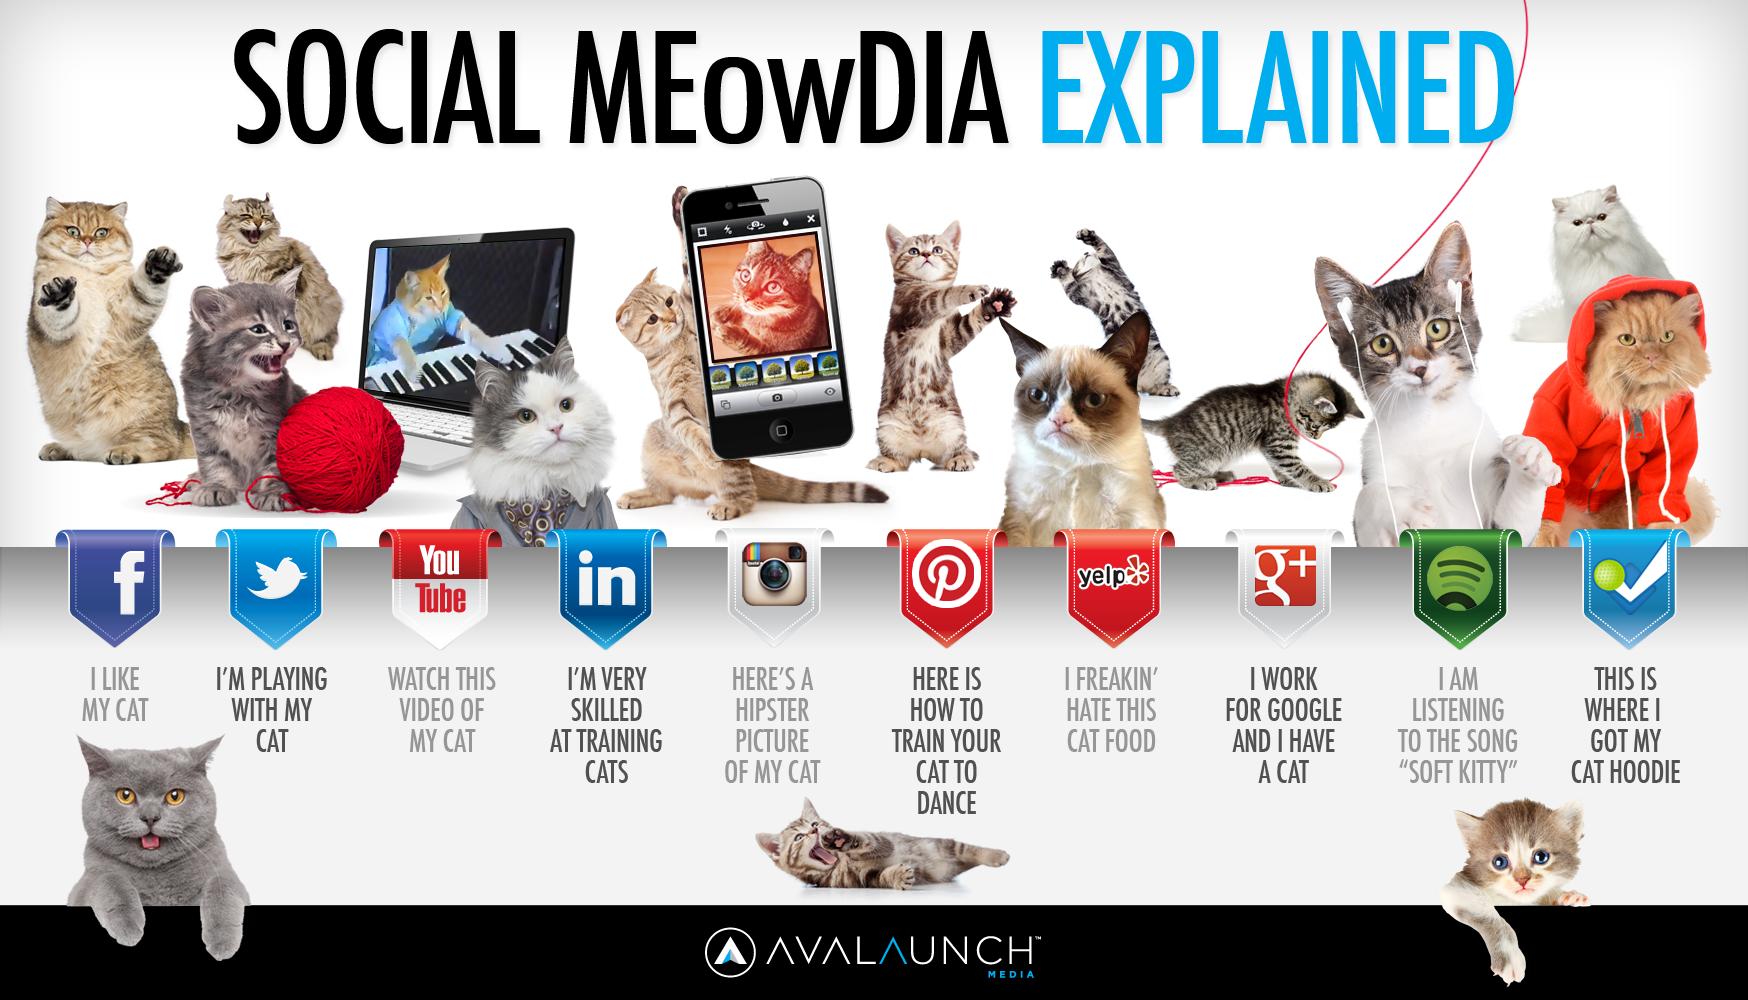 Social MEowDia Explained